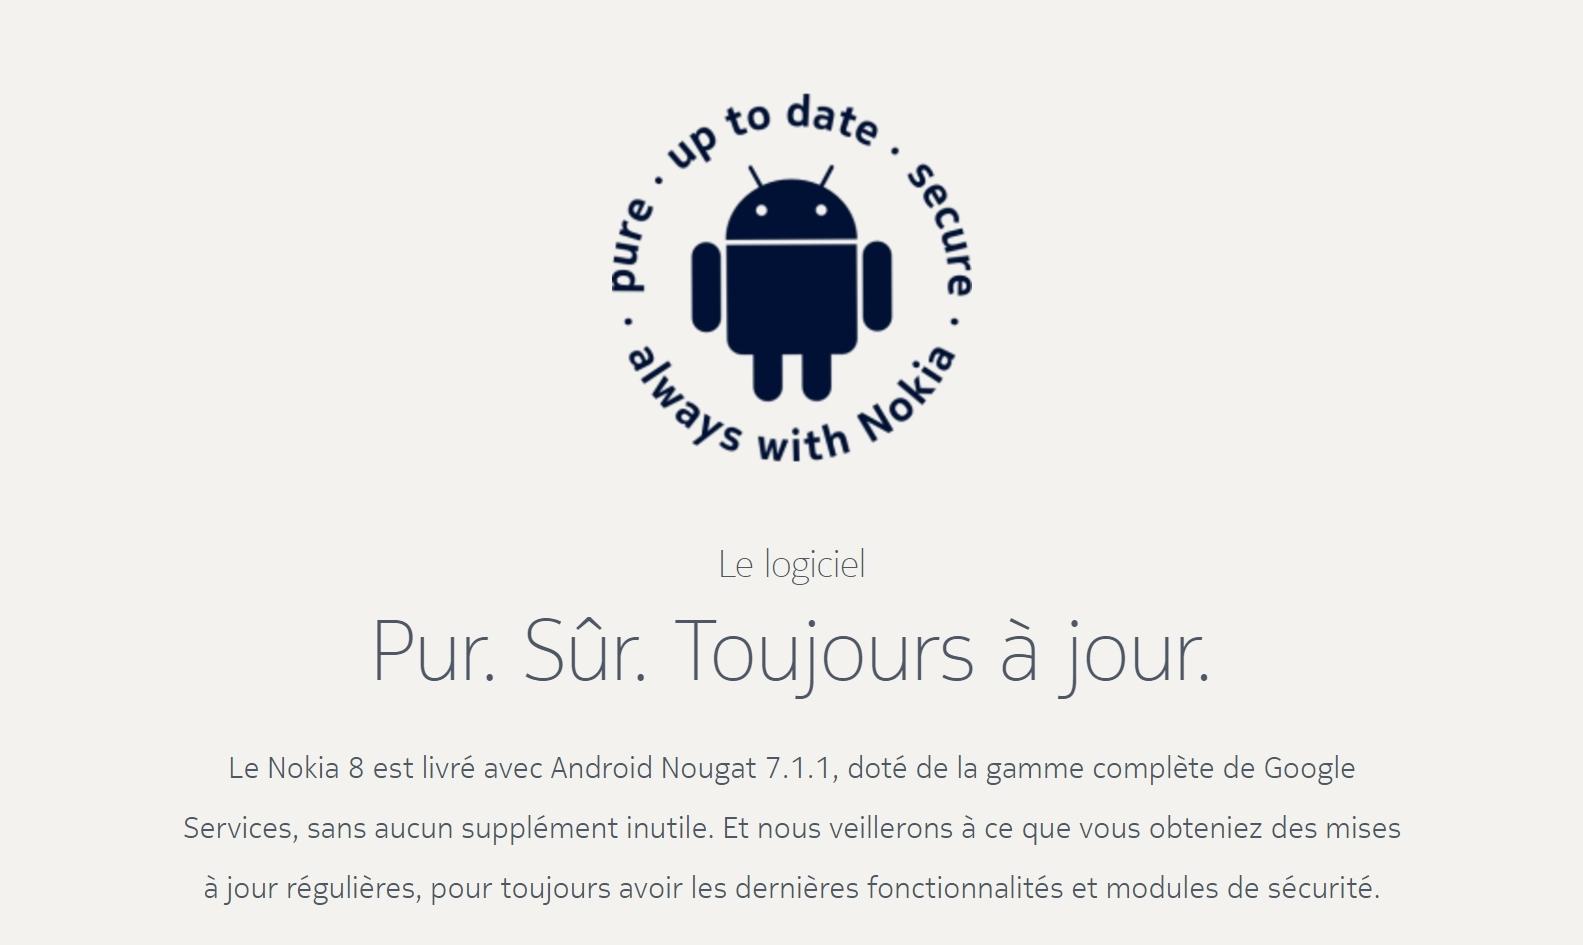 Mise à jour vers Android 8.0 Oreo : Nokia manque-t-il à sa promesse ?